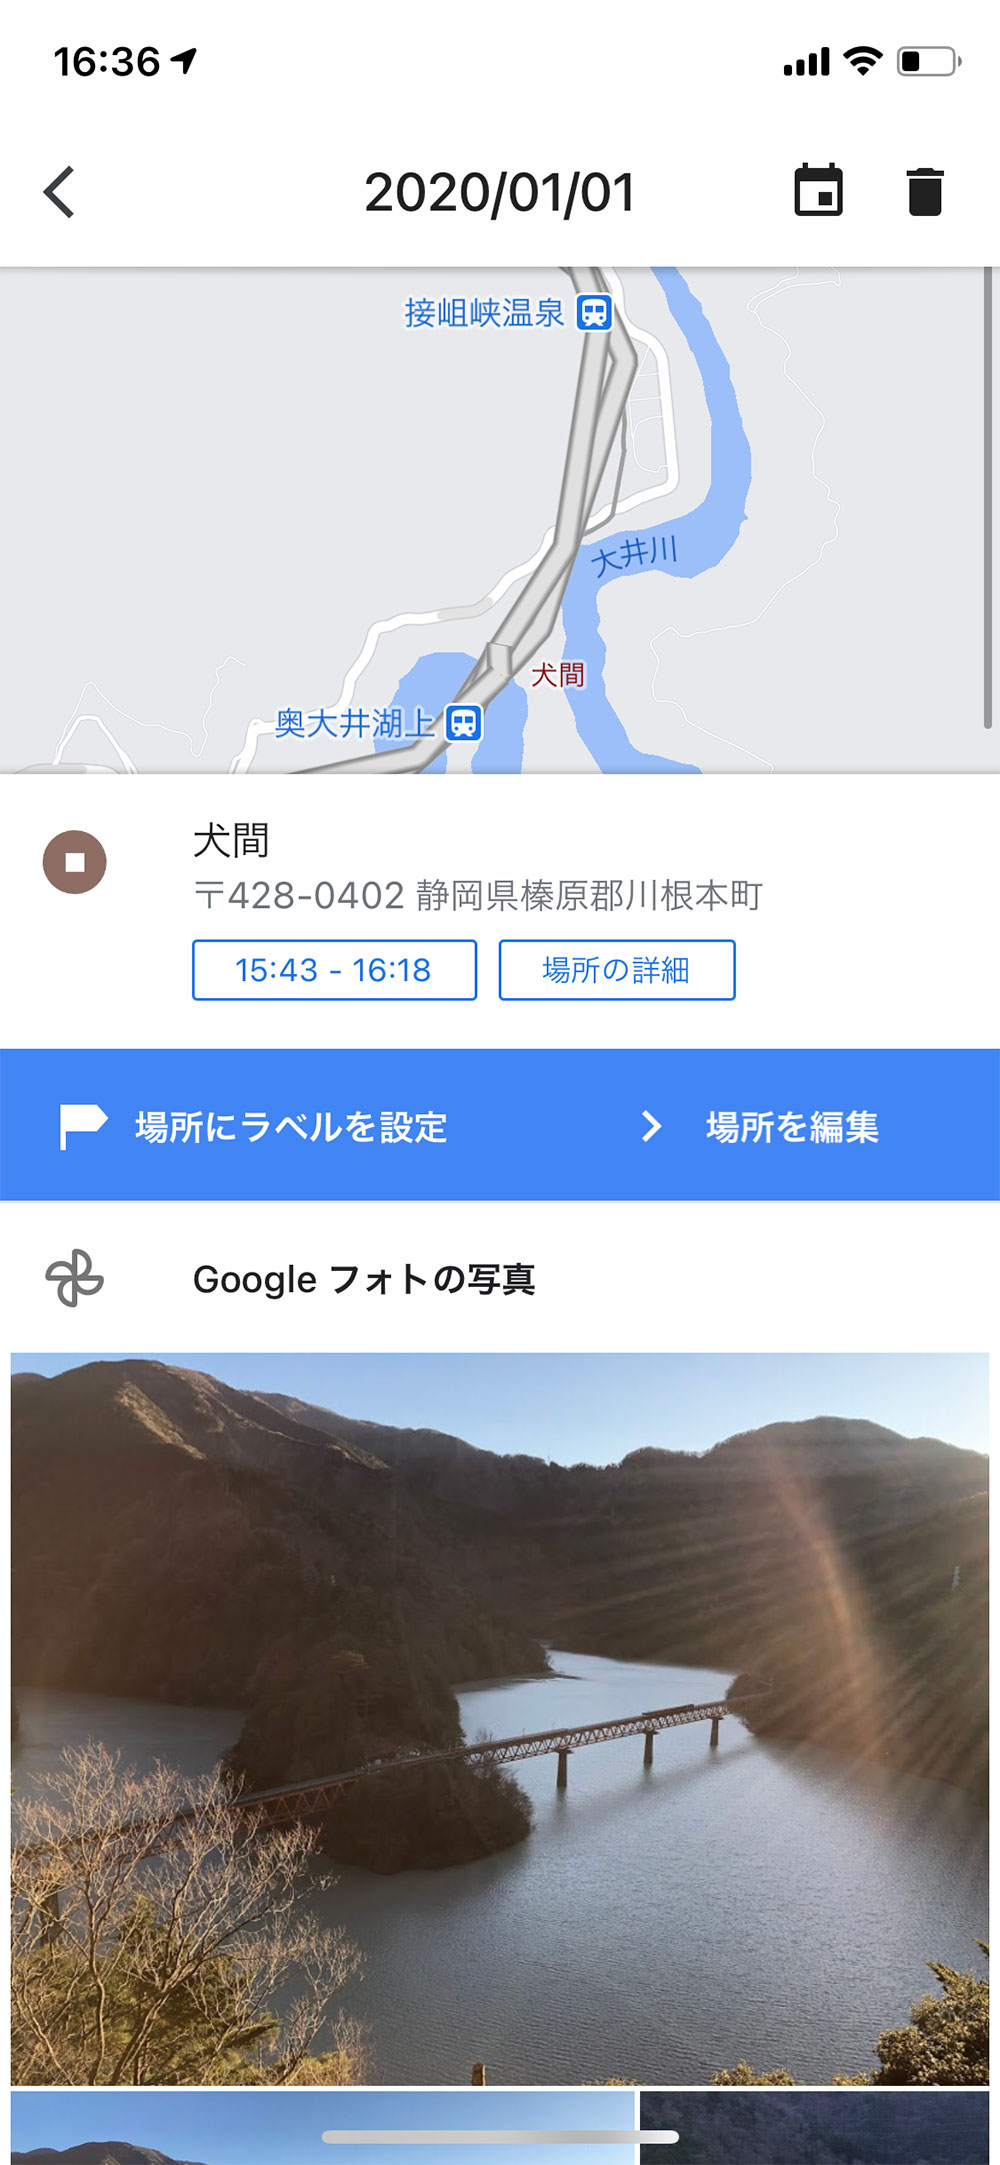 Googleマップ タイムライン活用法